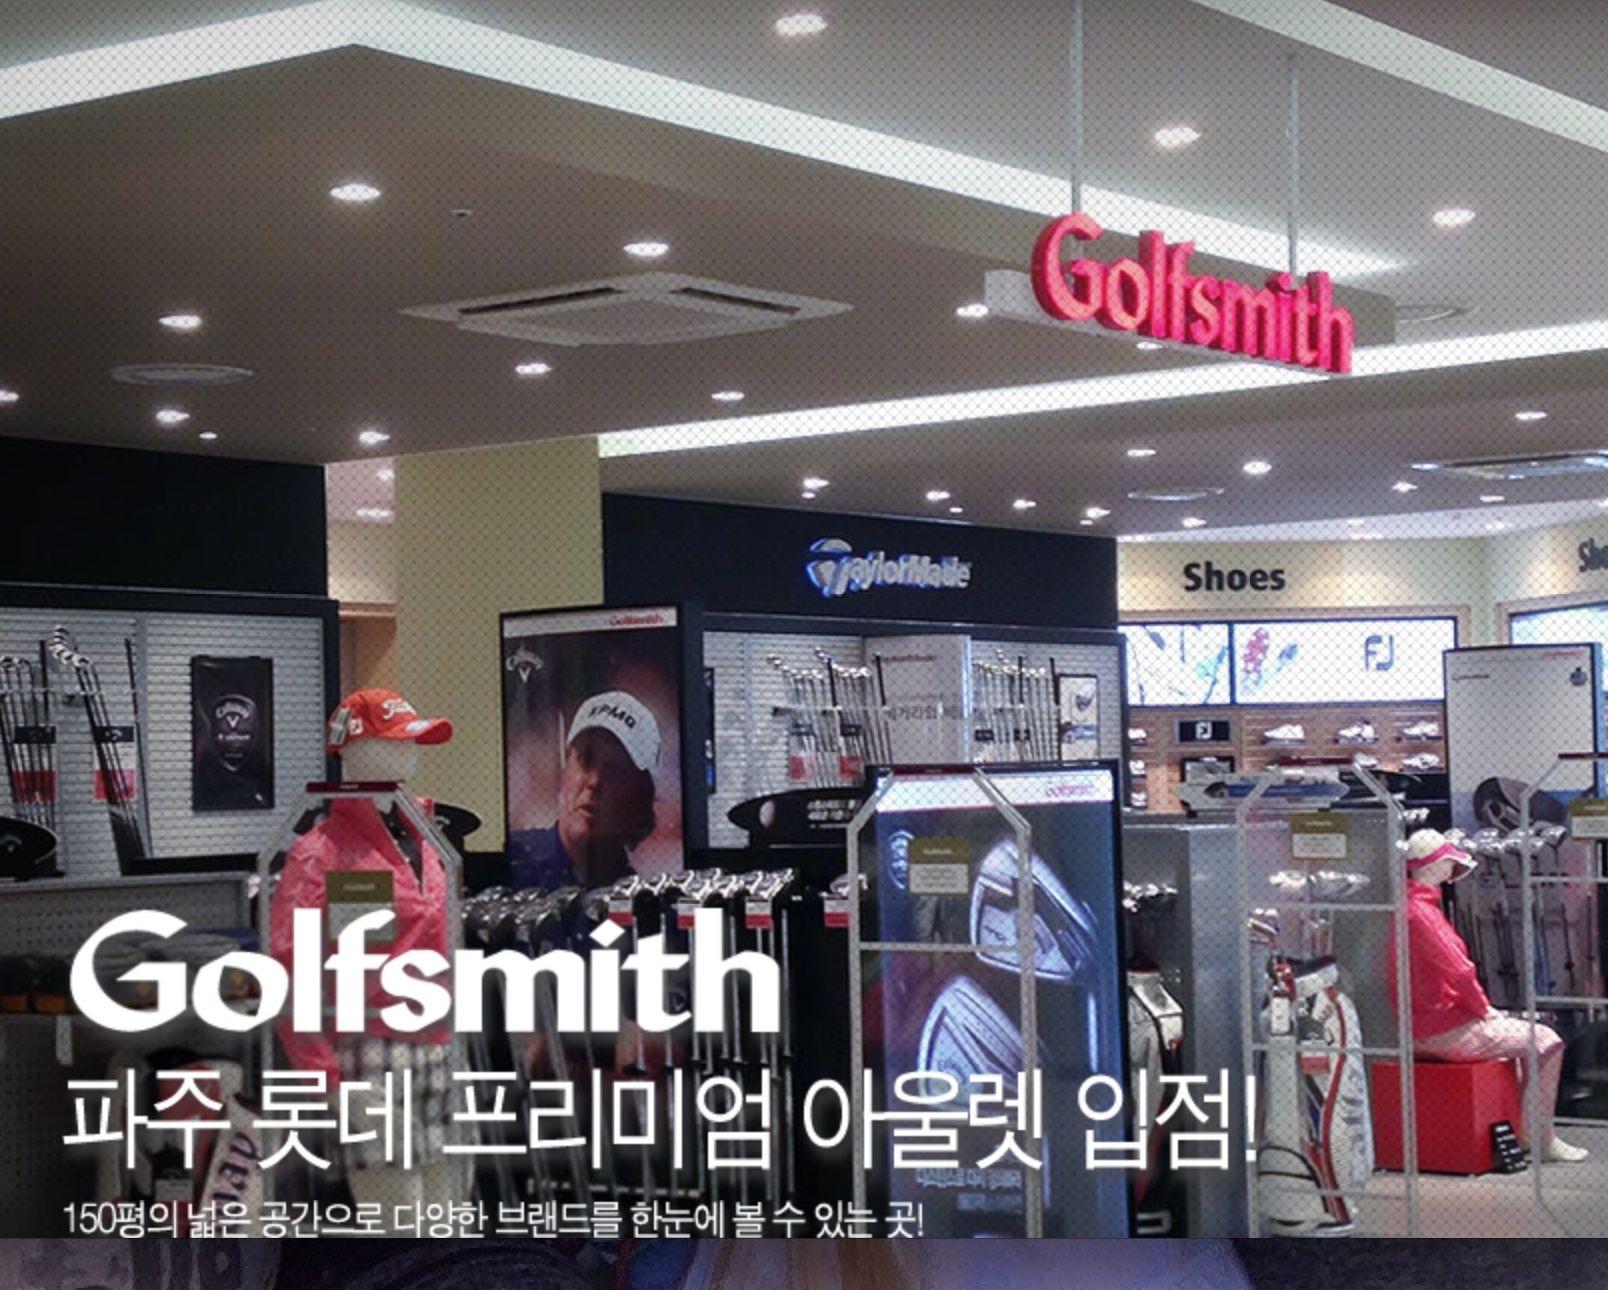 Golfsmith Korea Paju